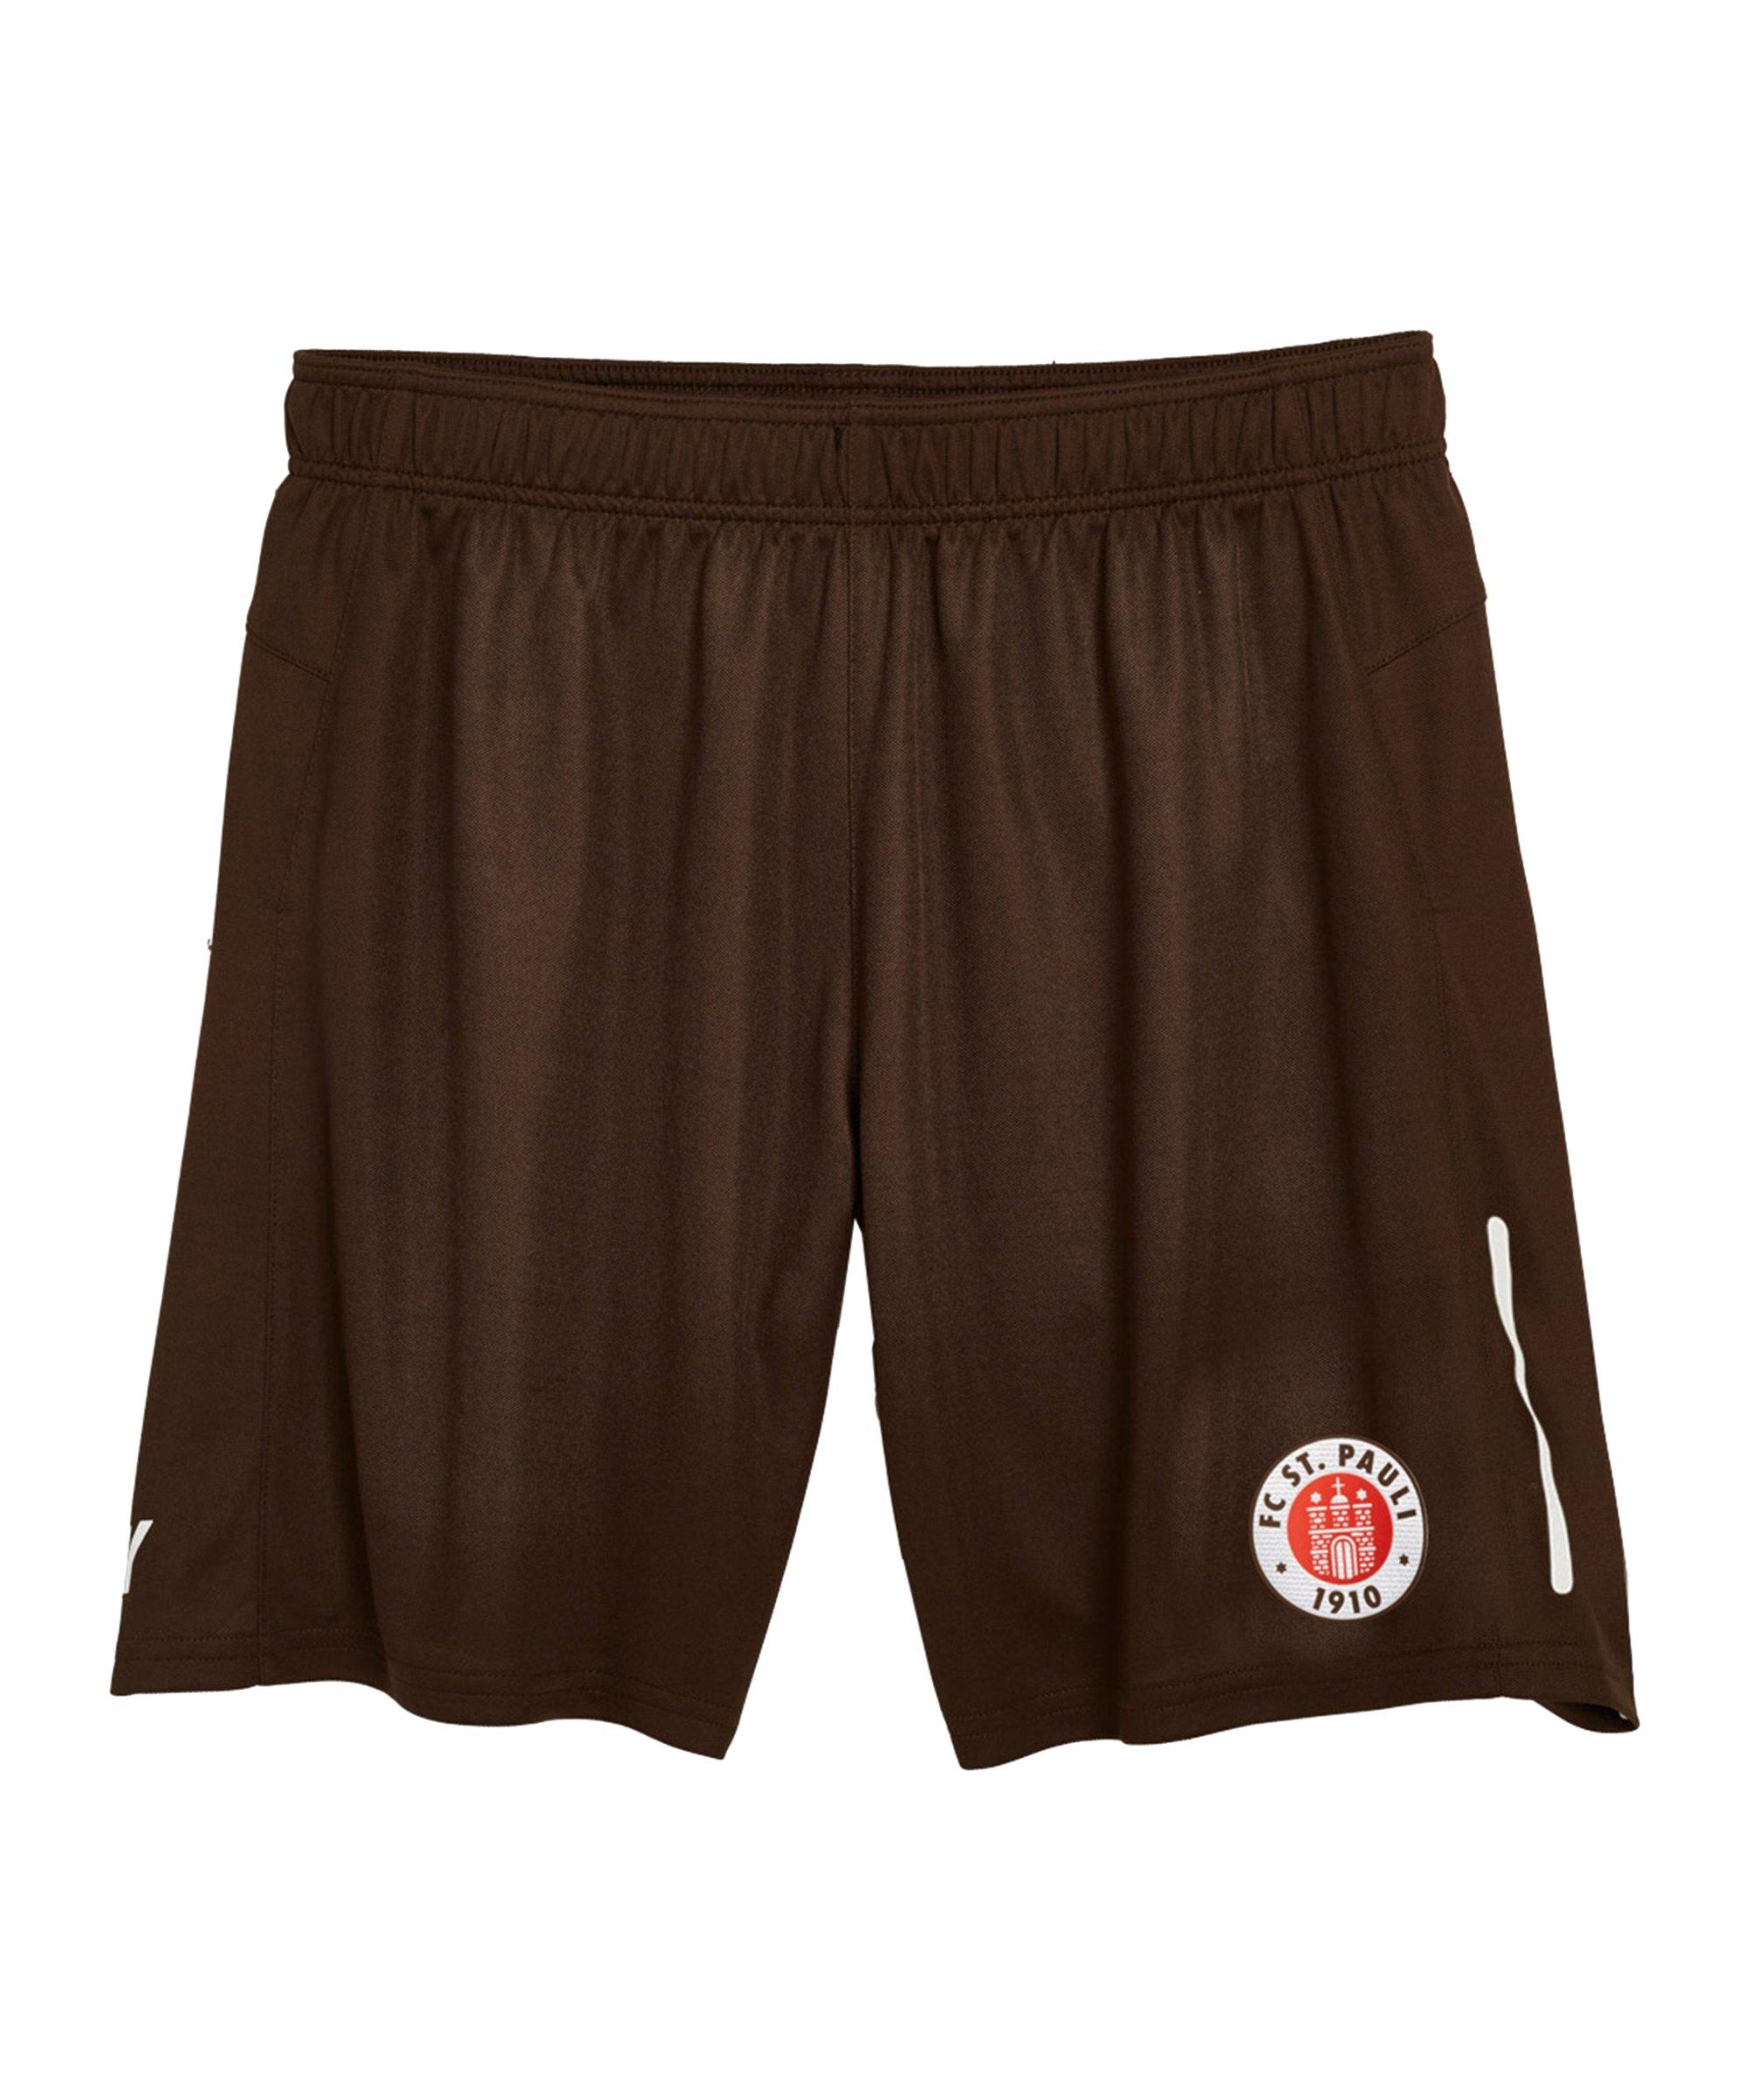 DIIY FC St. Pauli Short Home 2021/2022 Braun - braun